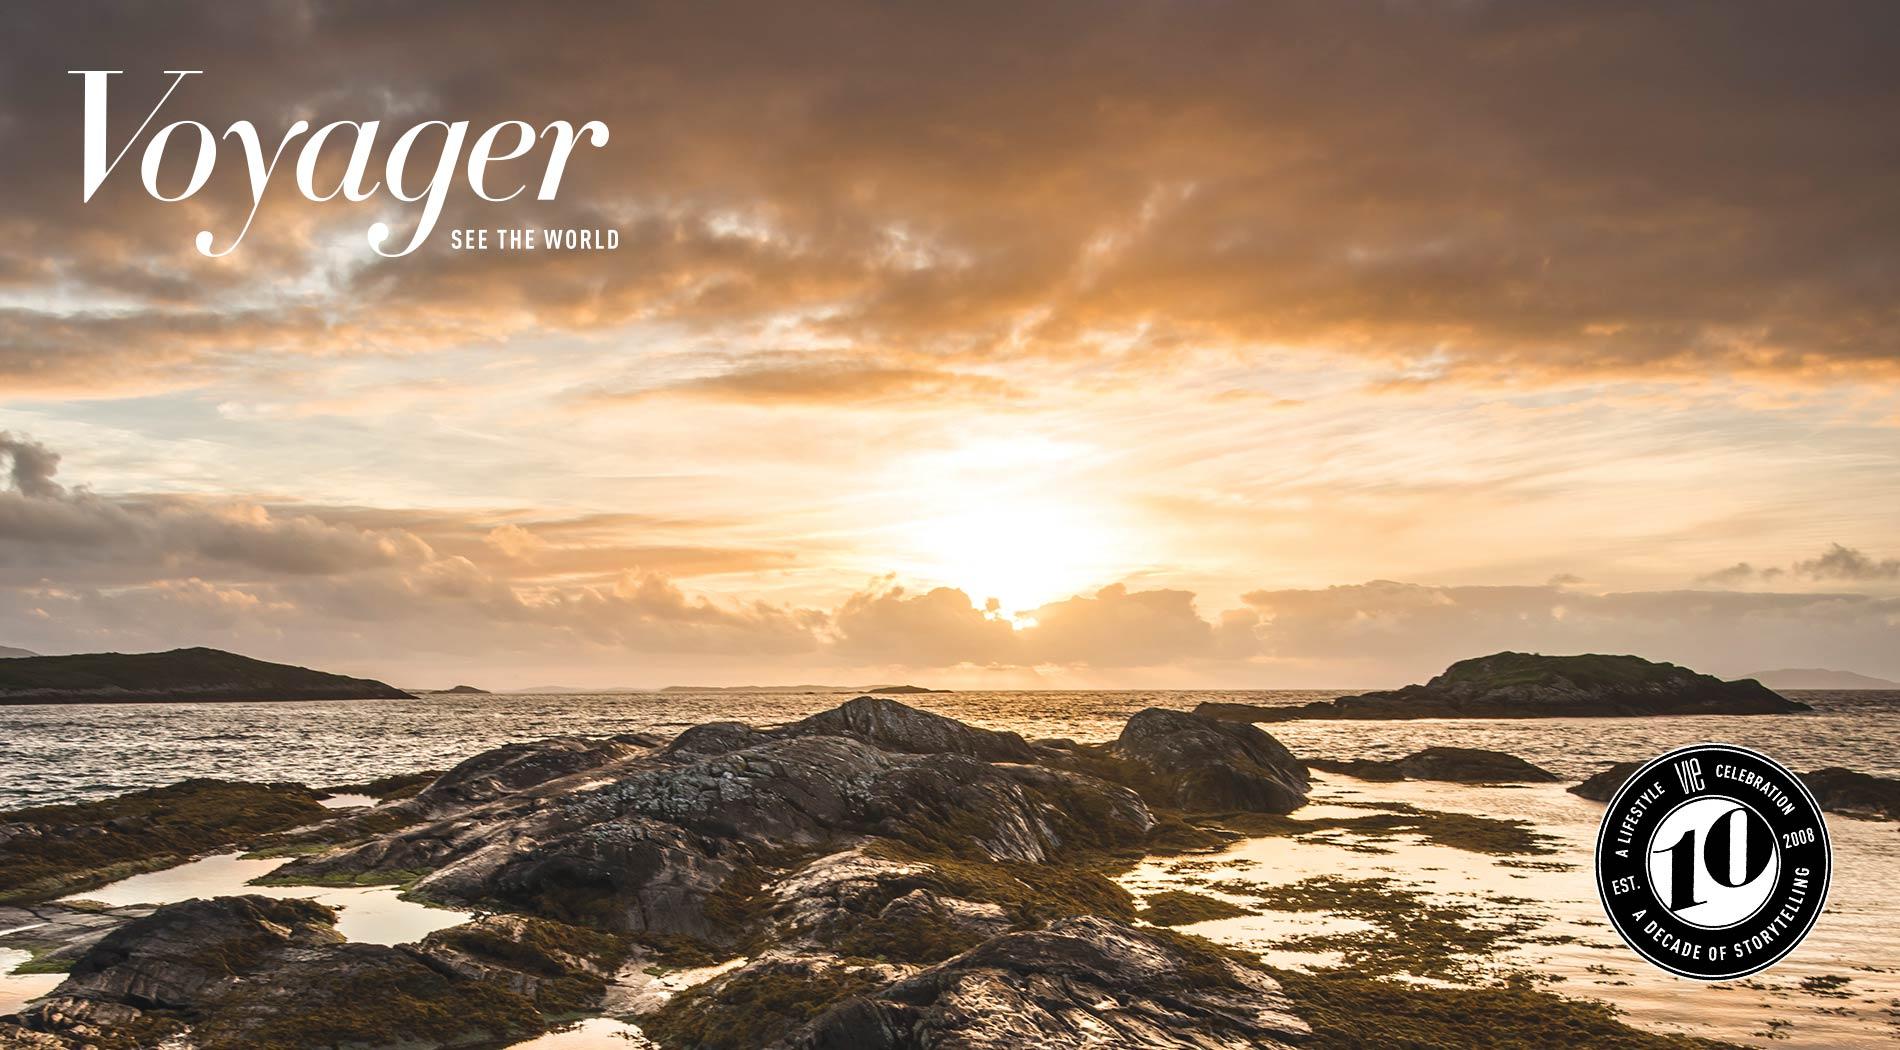 VIE Magazine - Special Anniversary Travel Edition - December 2018 - Voyager